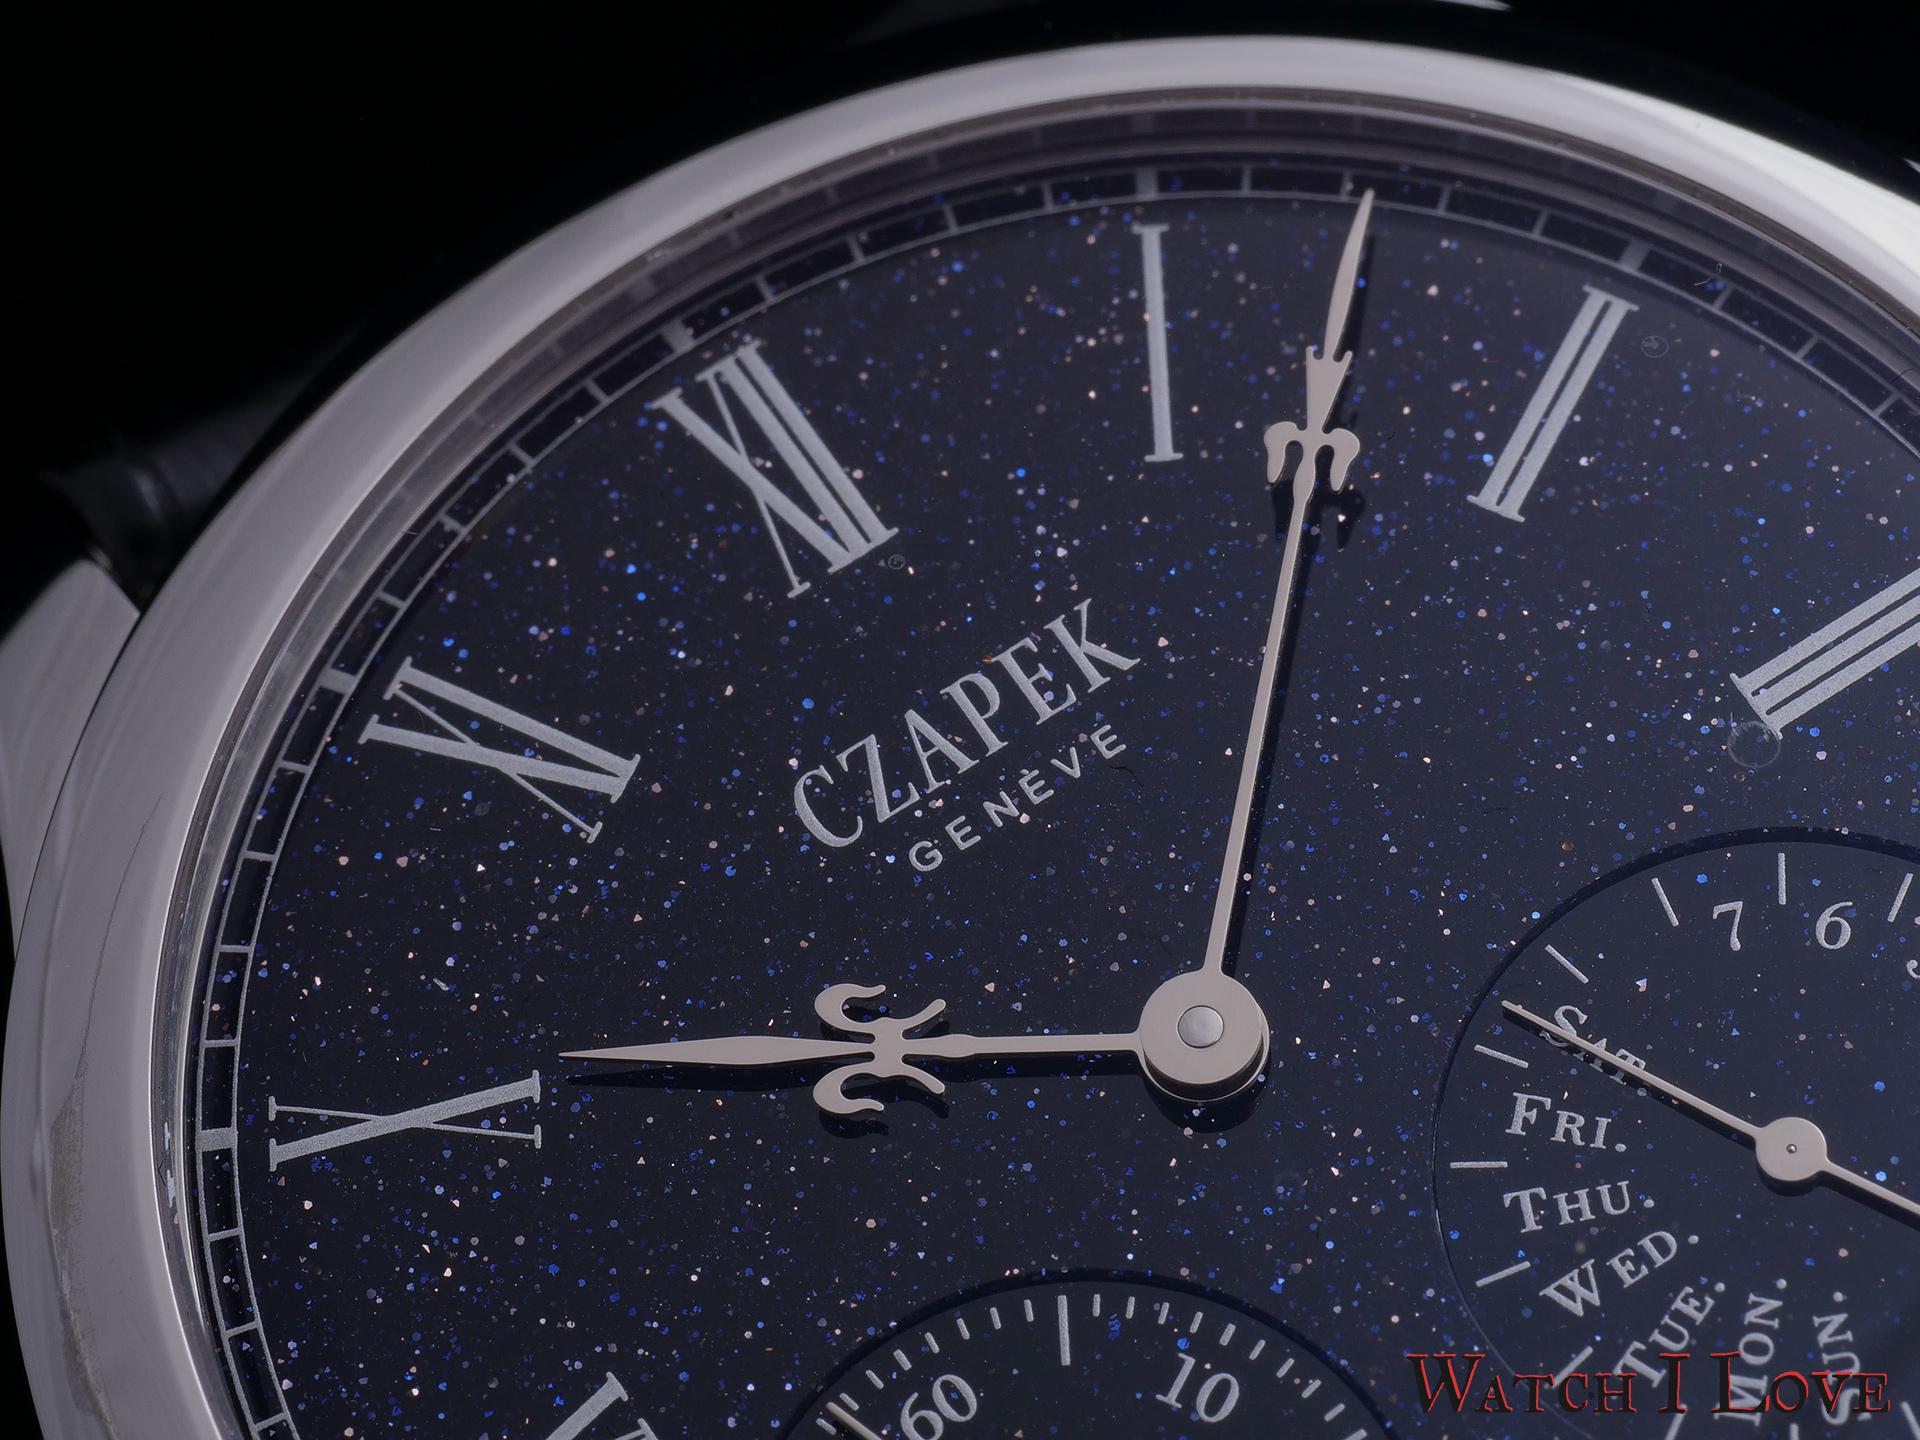 Czapek Midnight in Geneva Dial detail